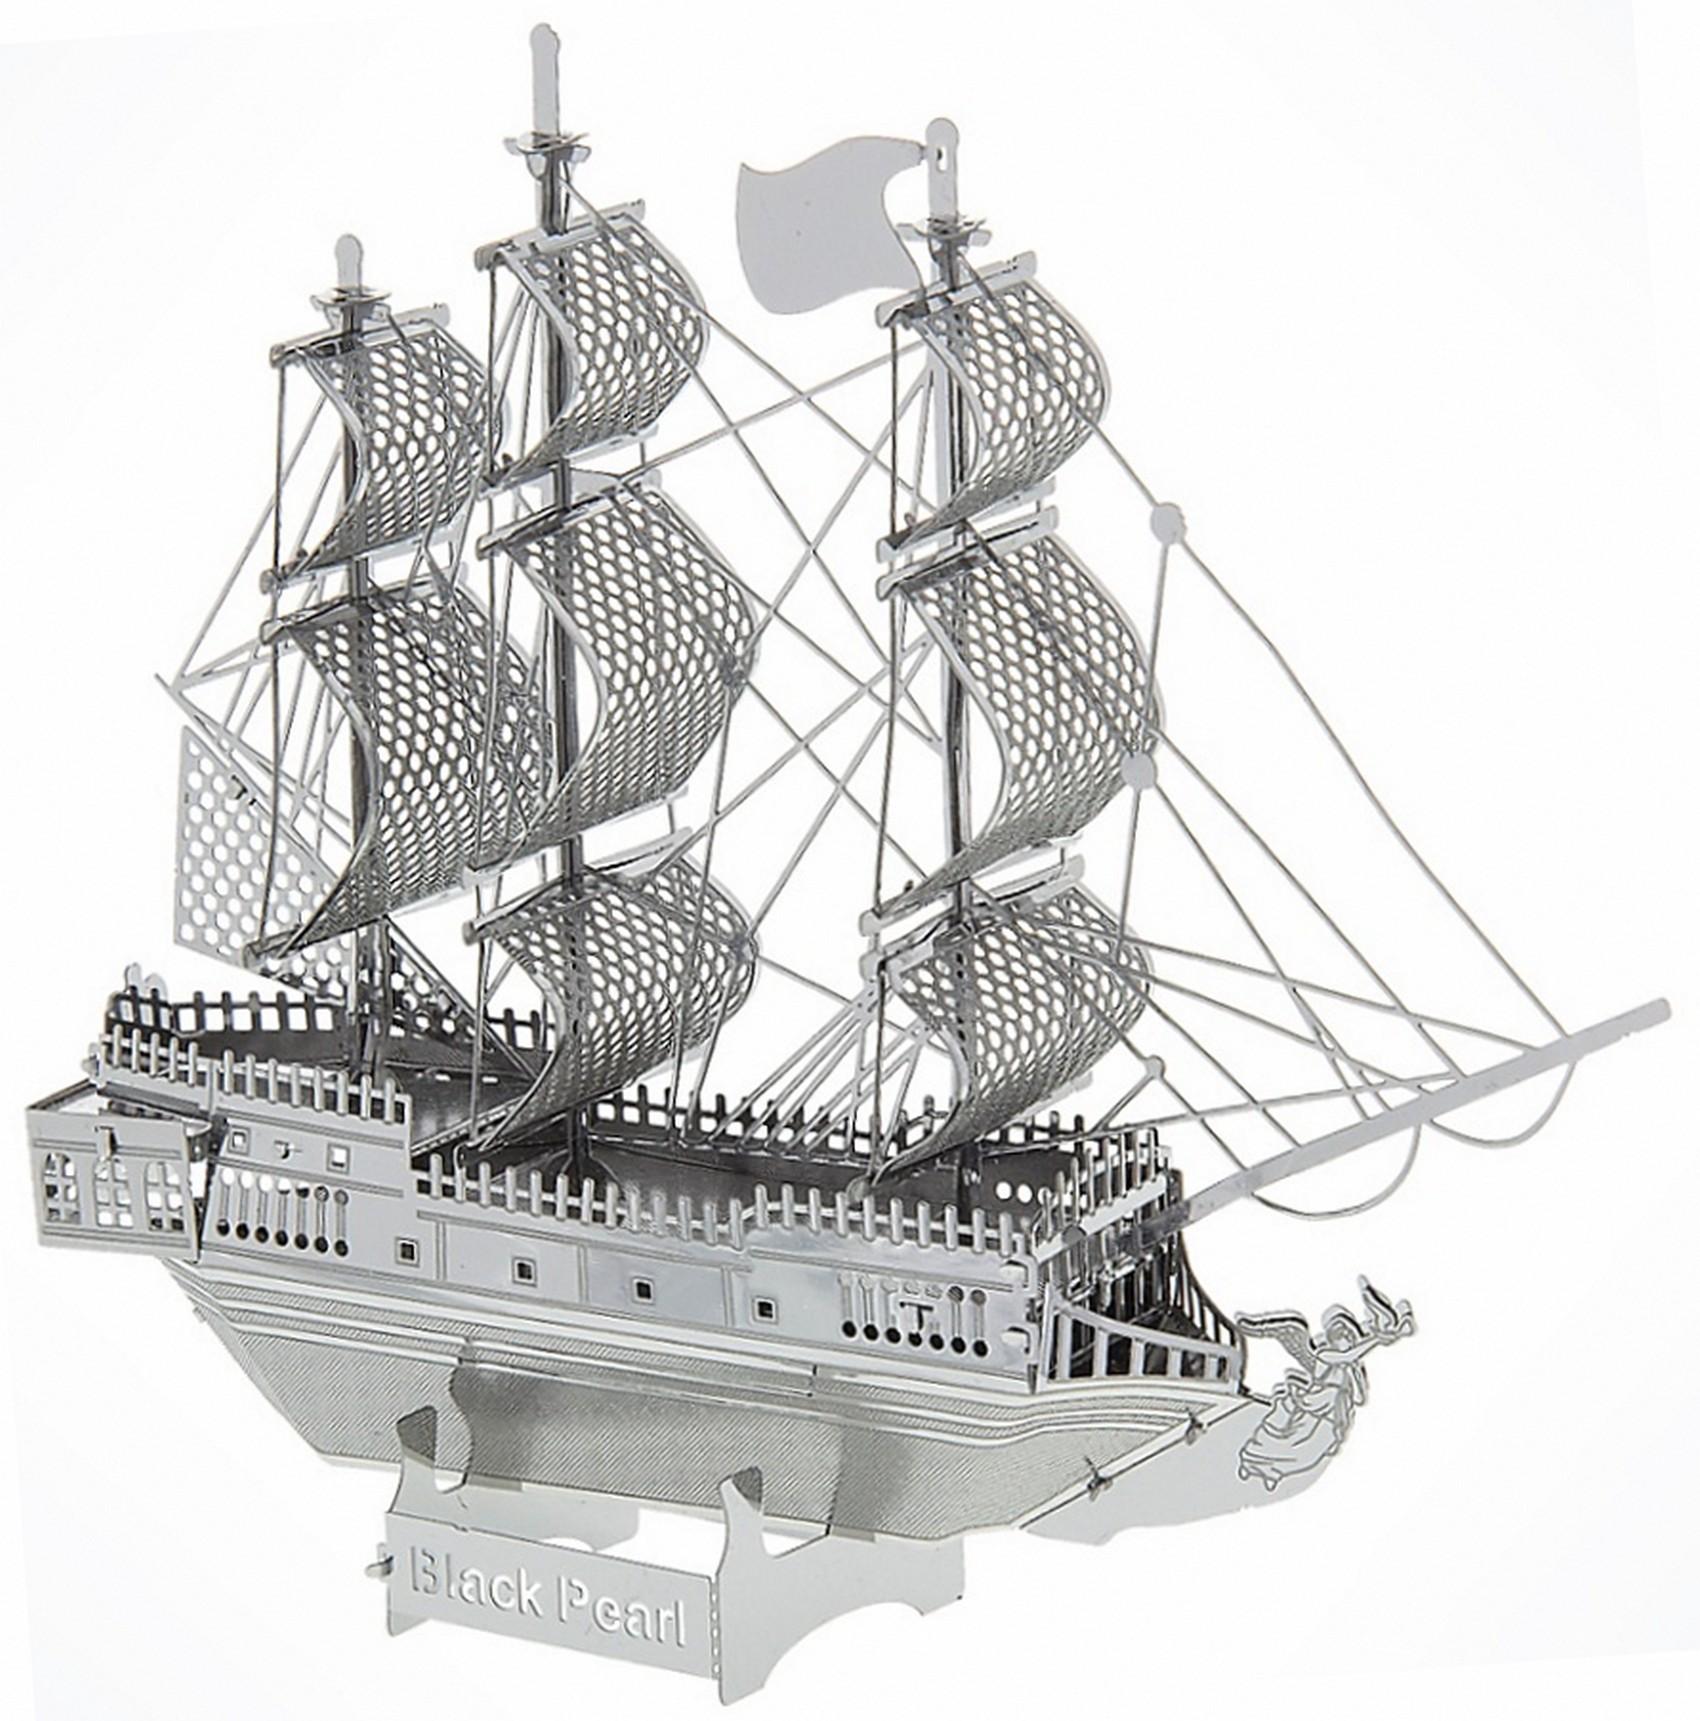 Pirates of the Caribbean The Black Pearl 3D Metal Model Kit - Disney Exclusive © Dizdude.com